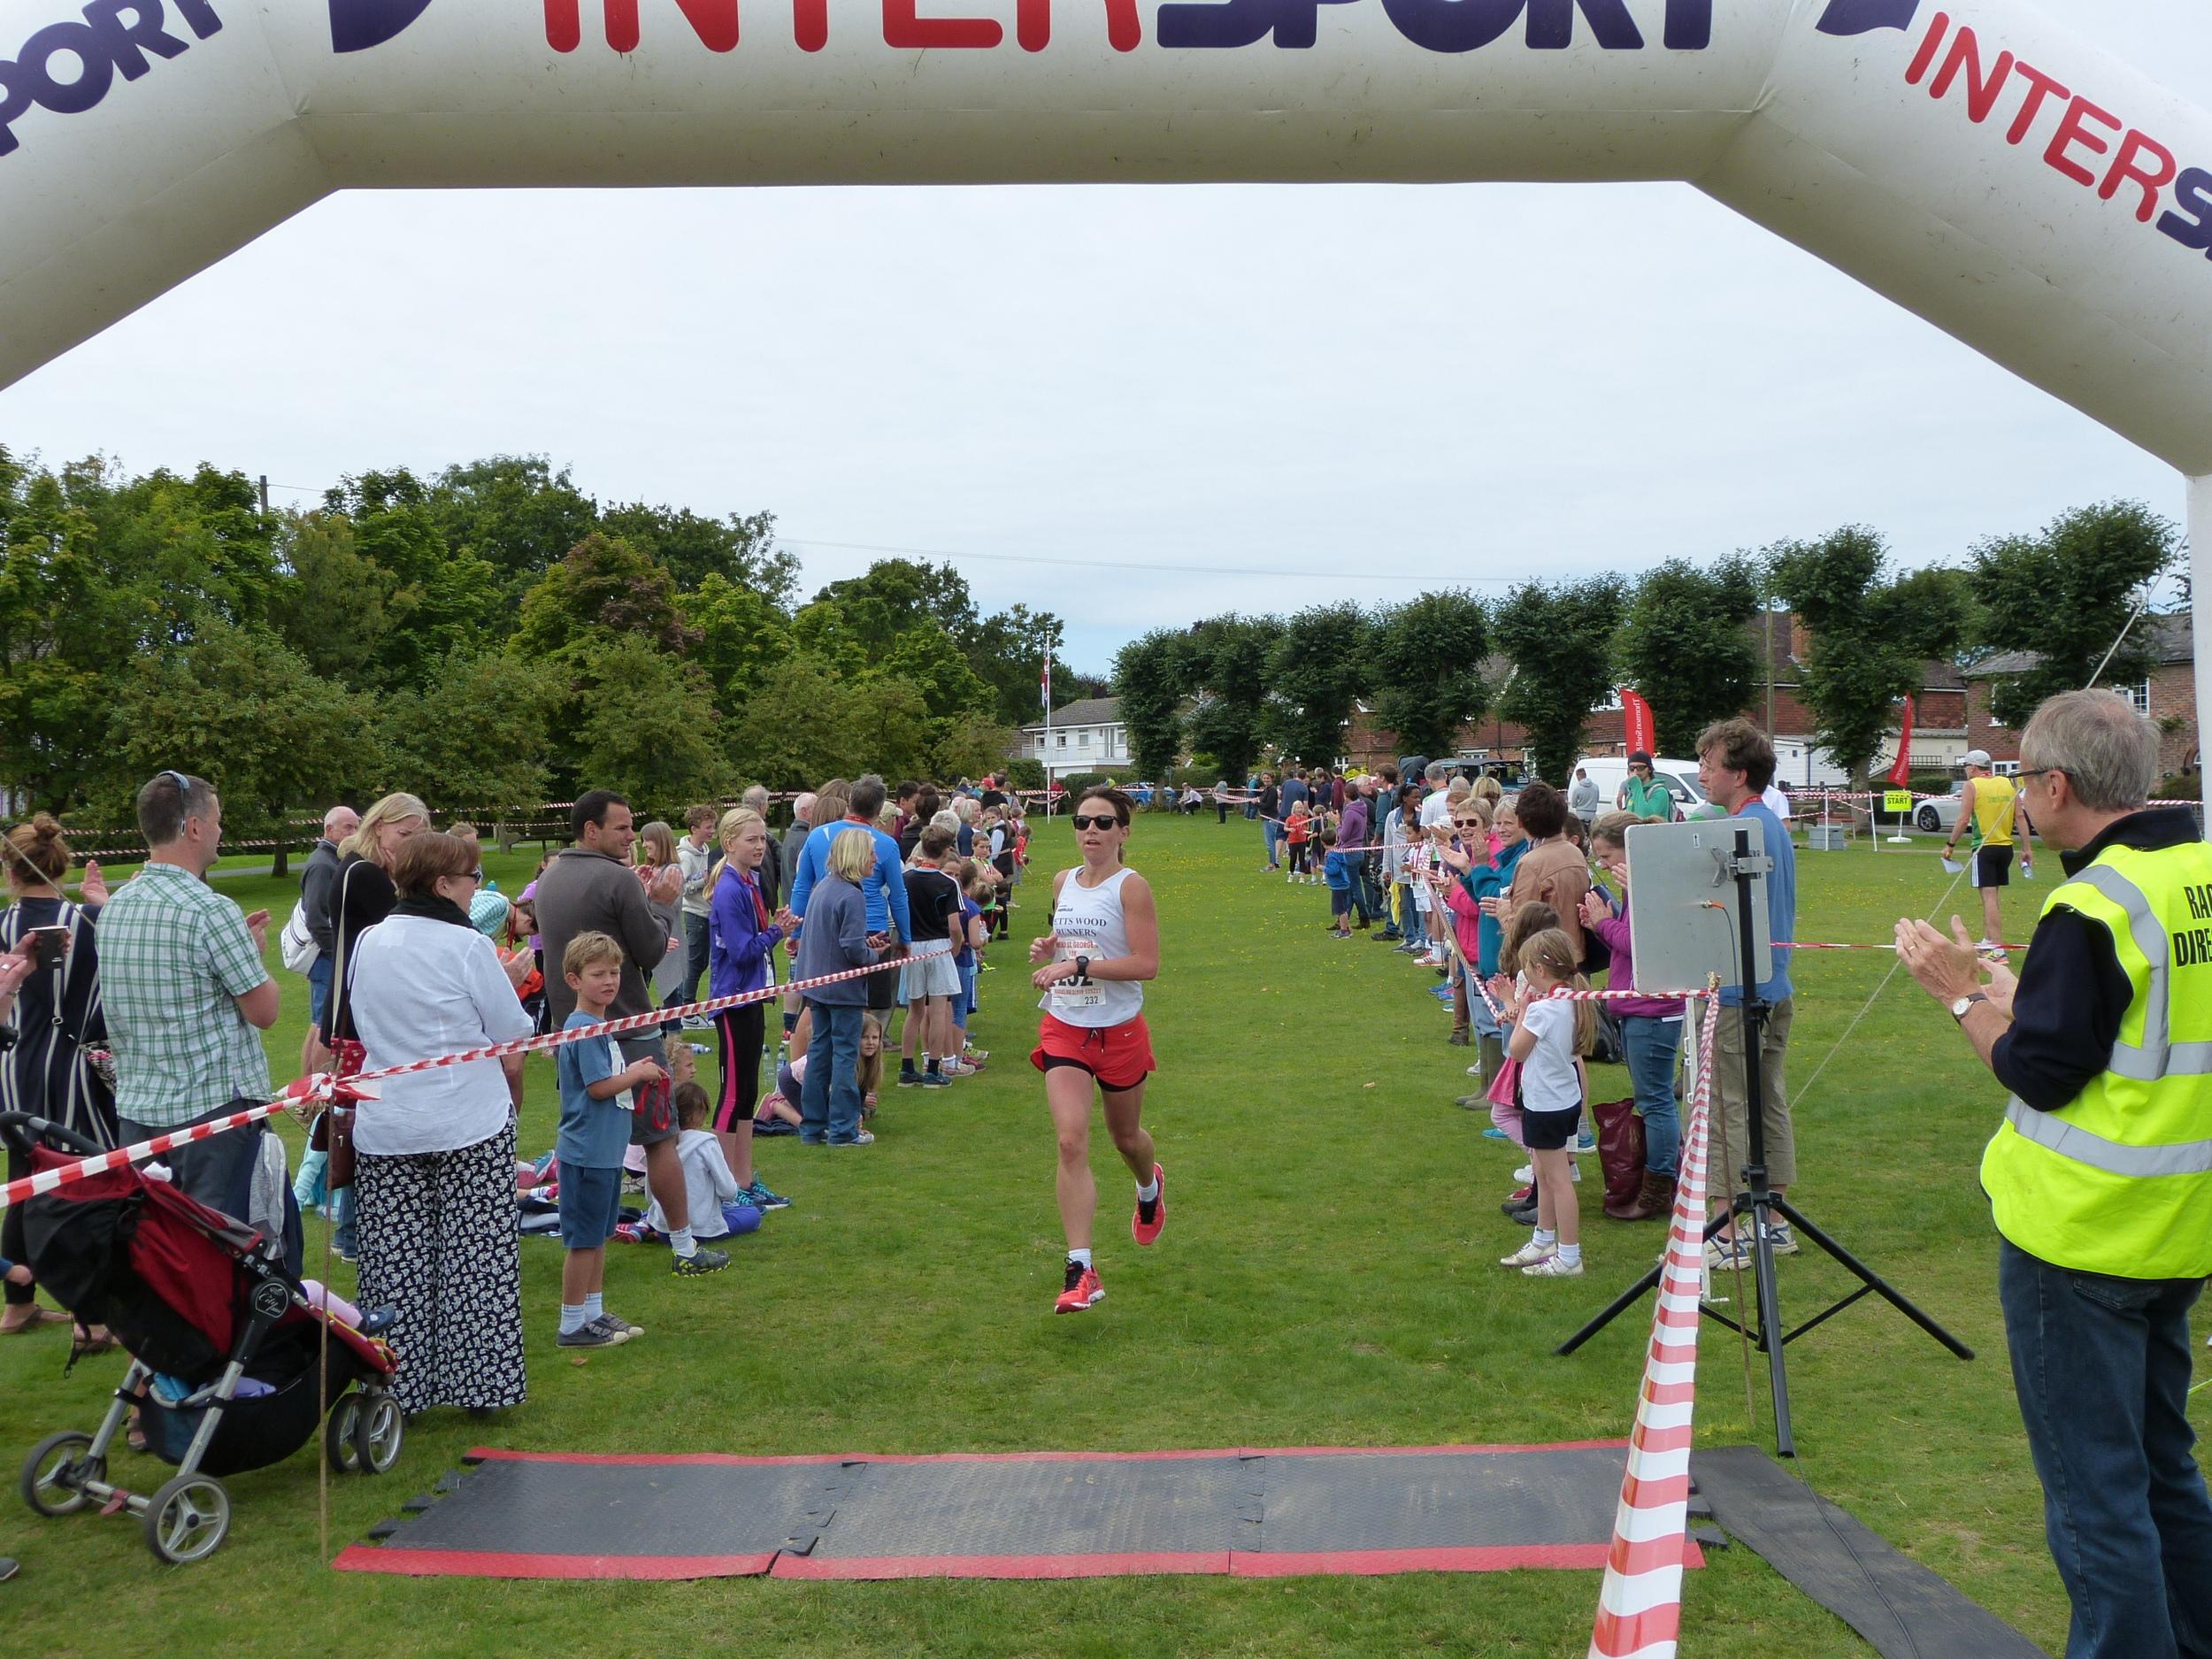 Ladies 3rd place Emma Crawford 00:41:25